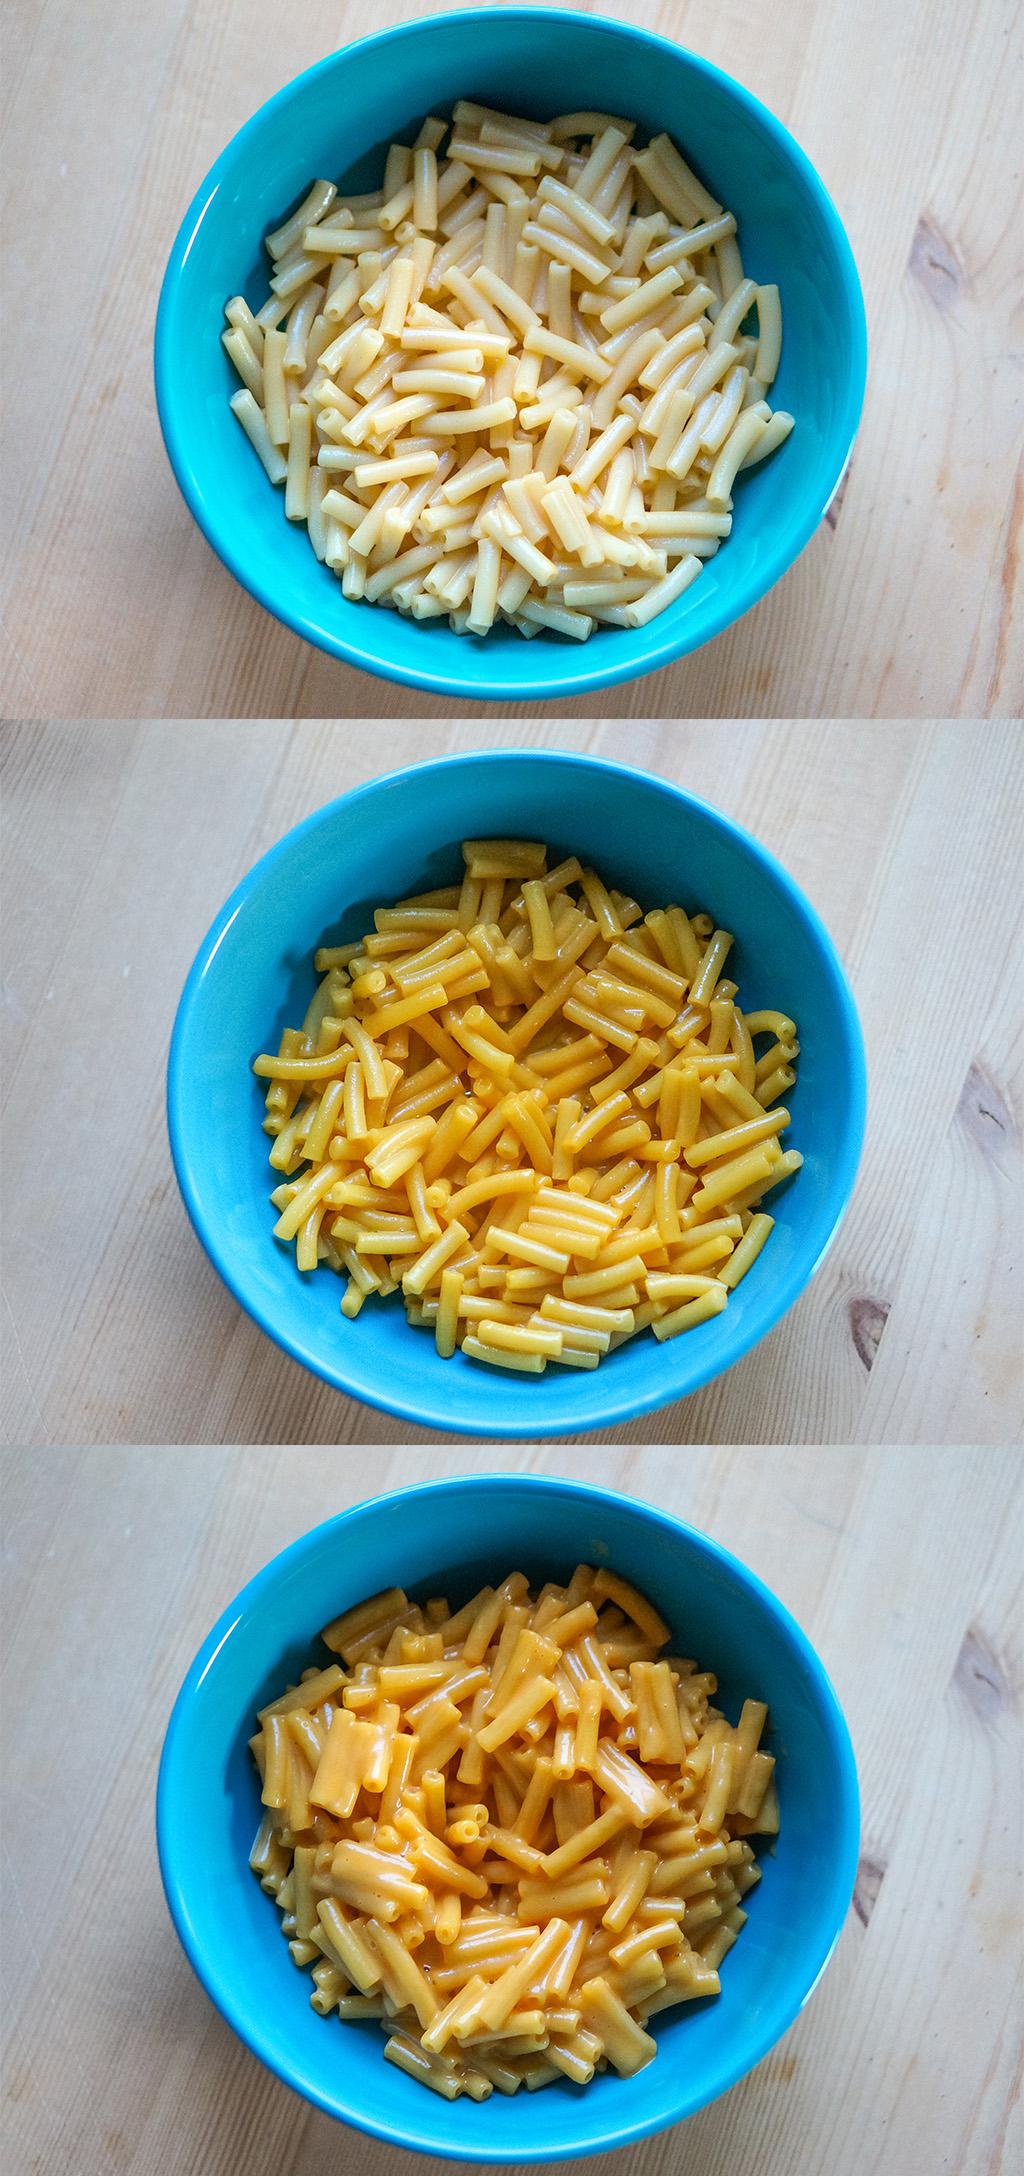 Bowls Kraft Dinner.The Food Girl in Town